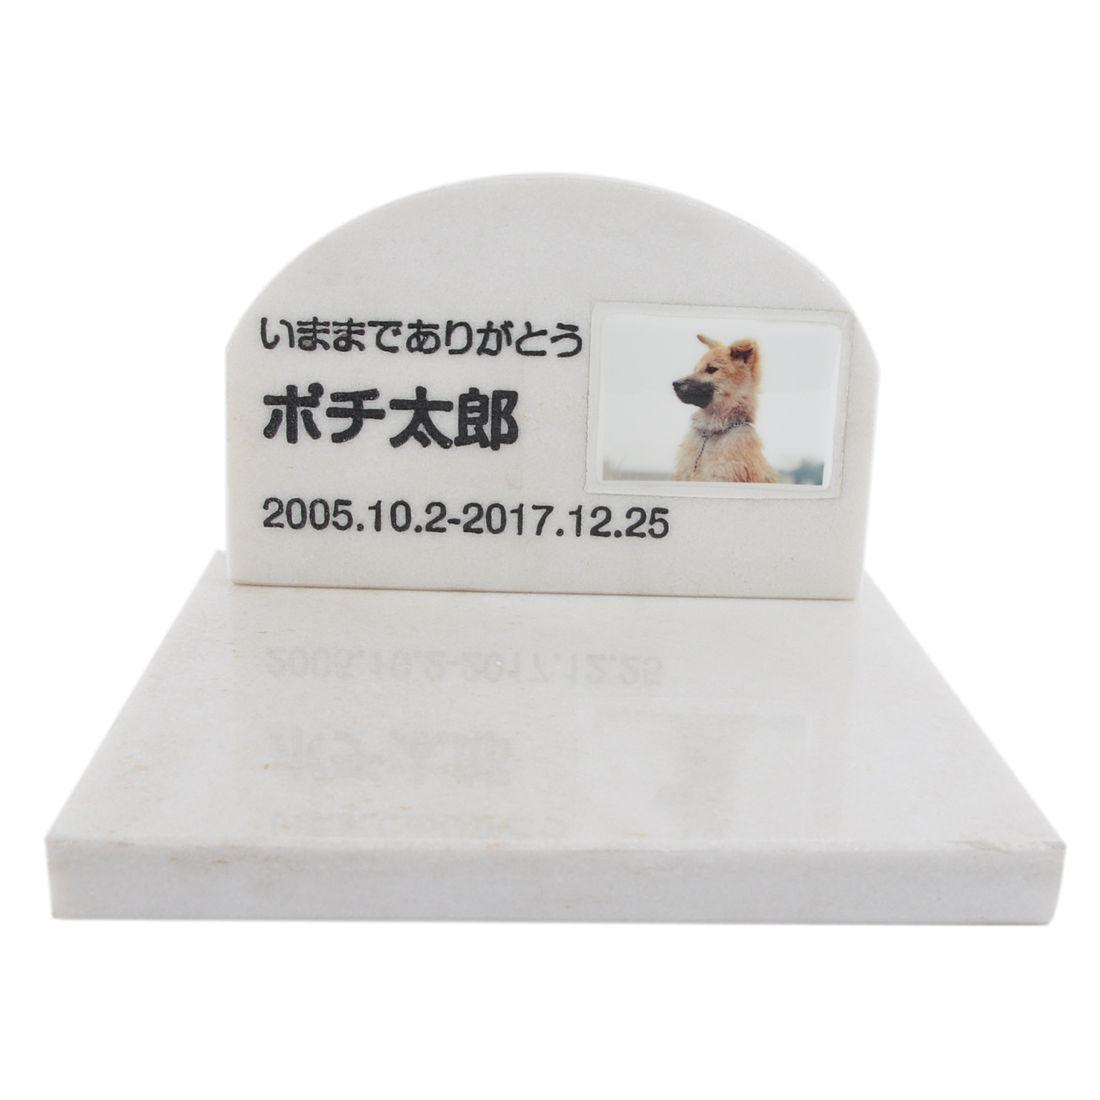 Pet&Love. ペットのお墓 天然石製 セット型 遺影付きタイプ 大理石 ホワイト アーチ(お客様の写真を印刷)  【HLS_DU】【楽ギフ_名入れ】 attr169attr ctgr2ctgr sml3sml+ctgr2ctgr noanml